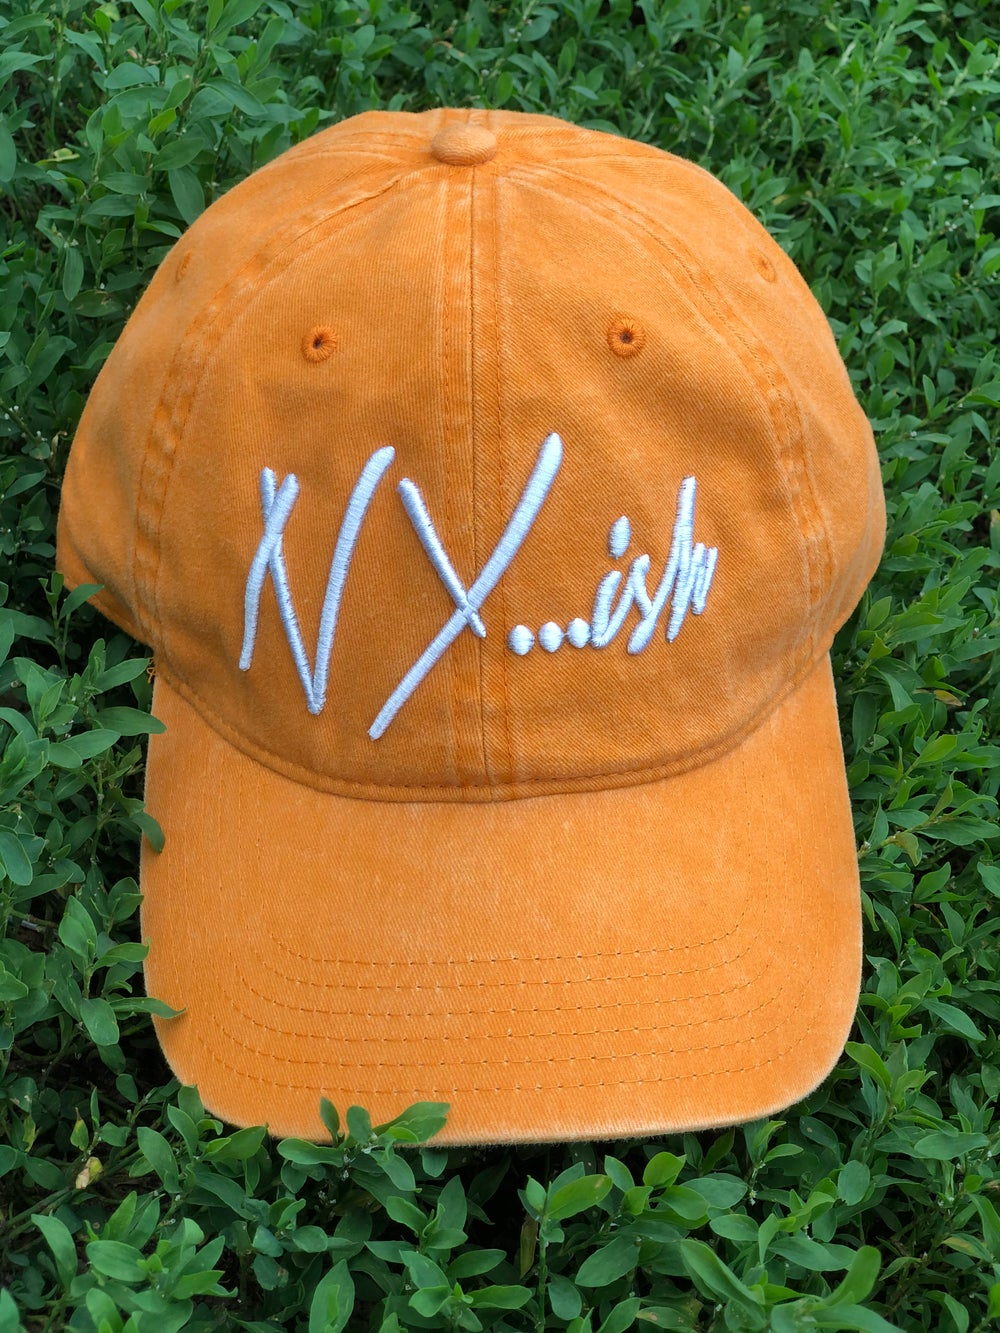 Image of Nyish Dad Hat (Orange) 4 left